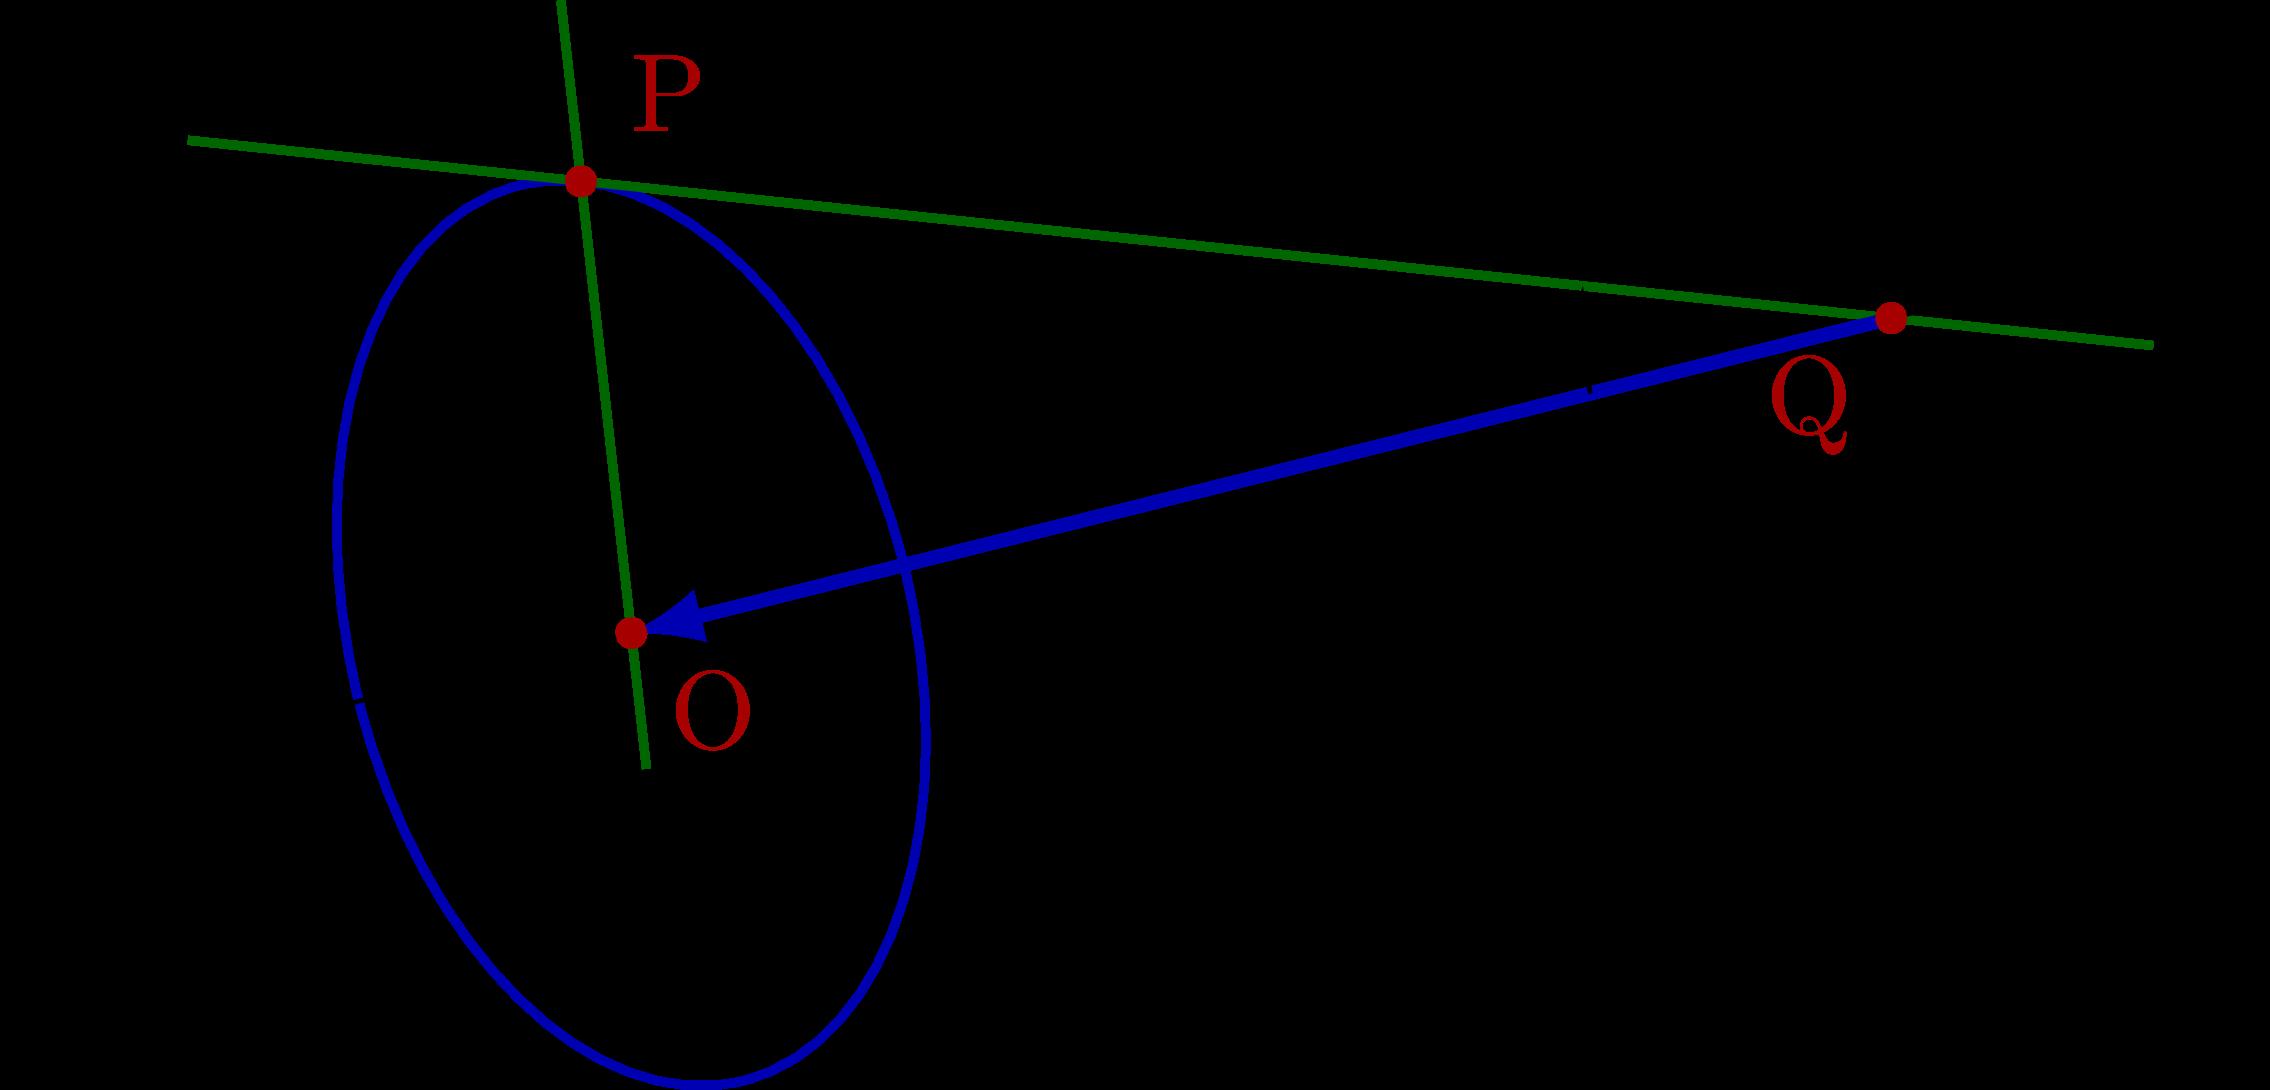 circle_tangent-007.png